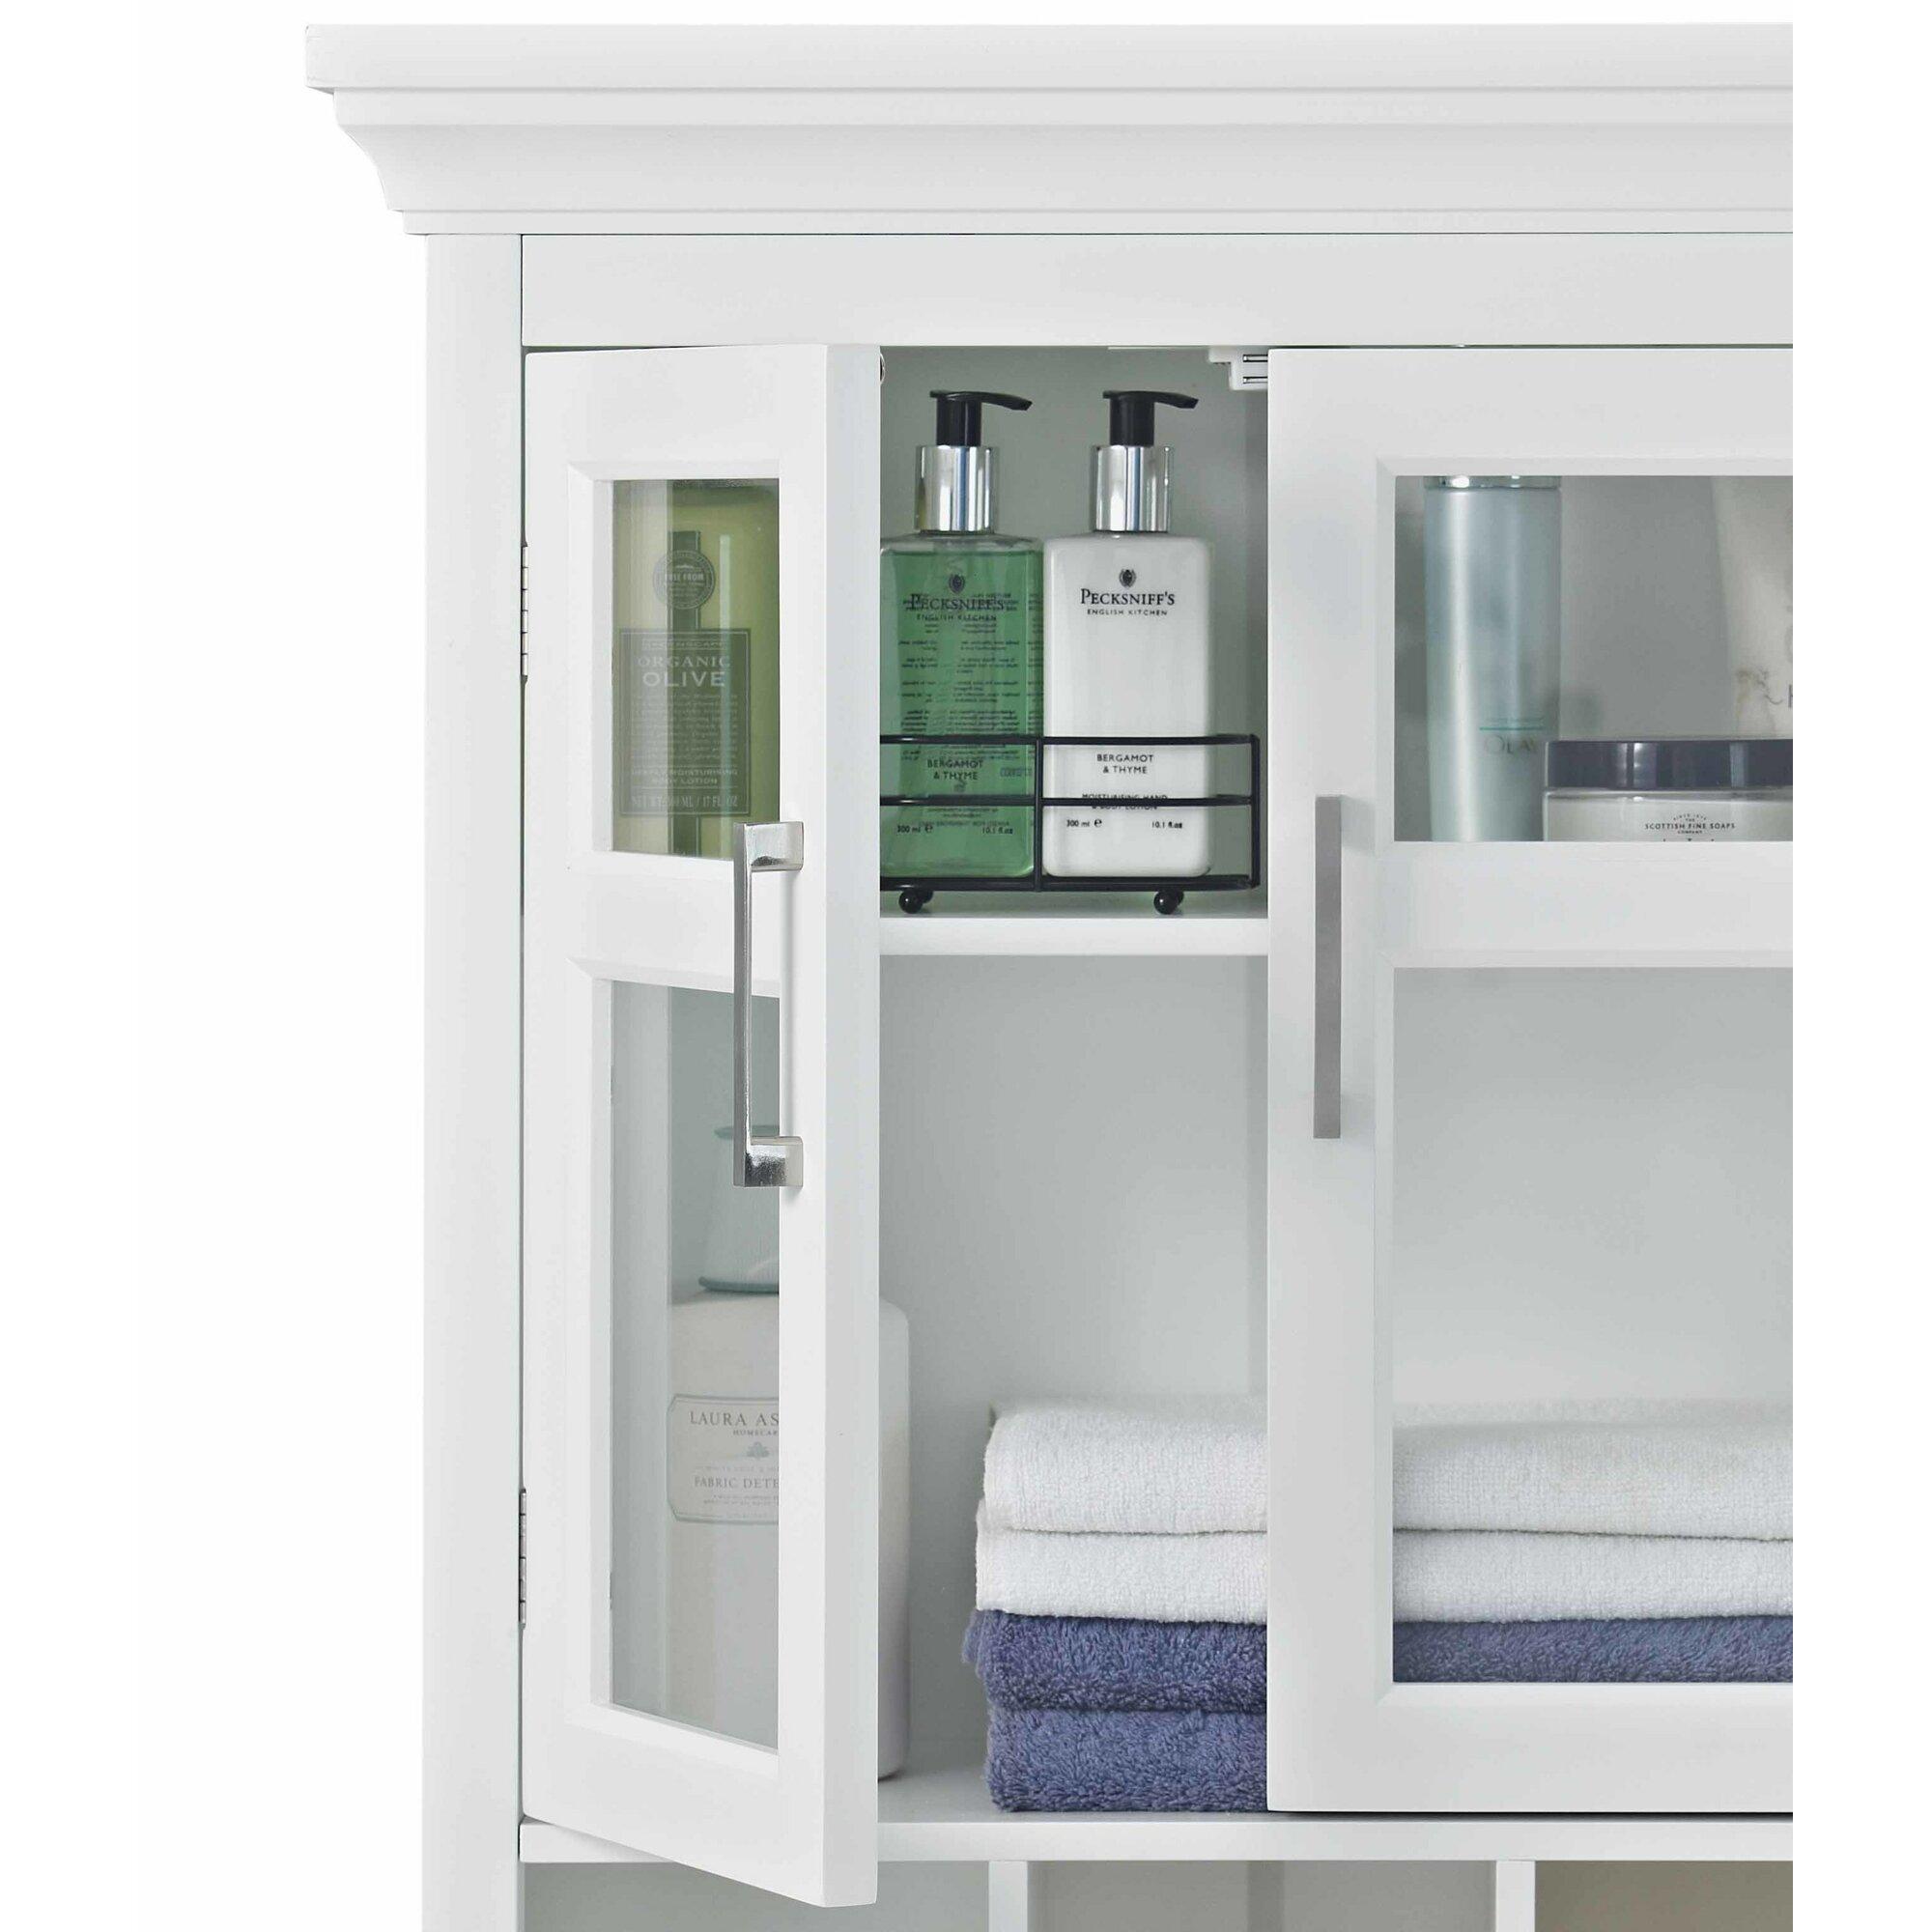 Bathroom storage wall cabinets - Avington 23 63 W X 30 13 H Wall Mounted Cabinet